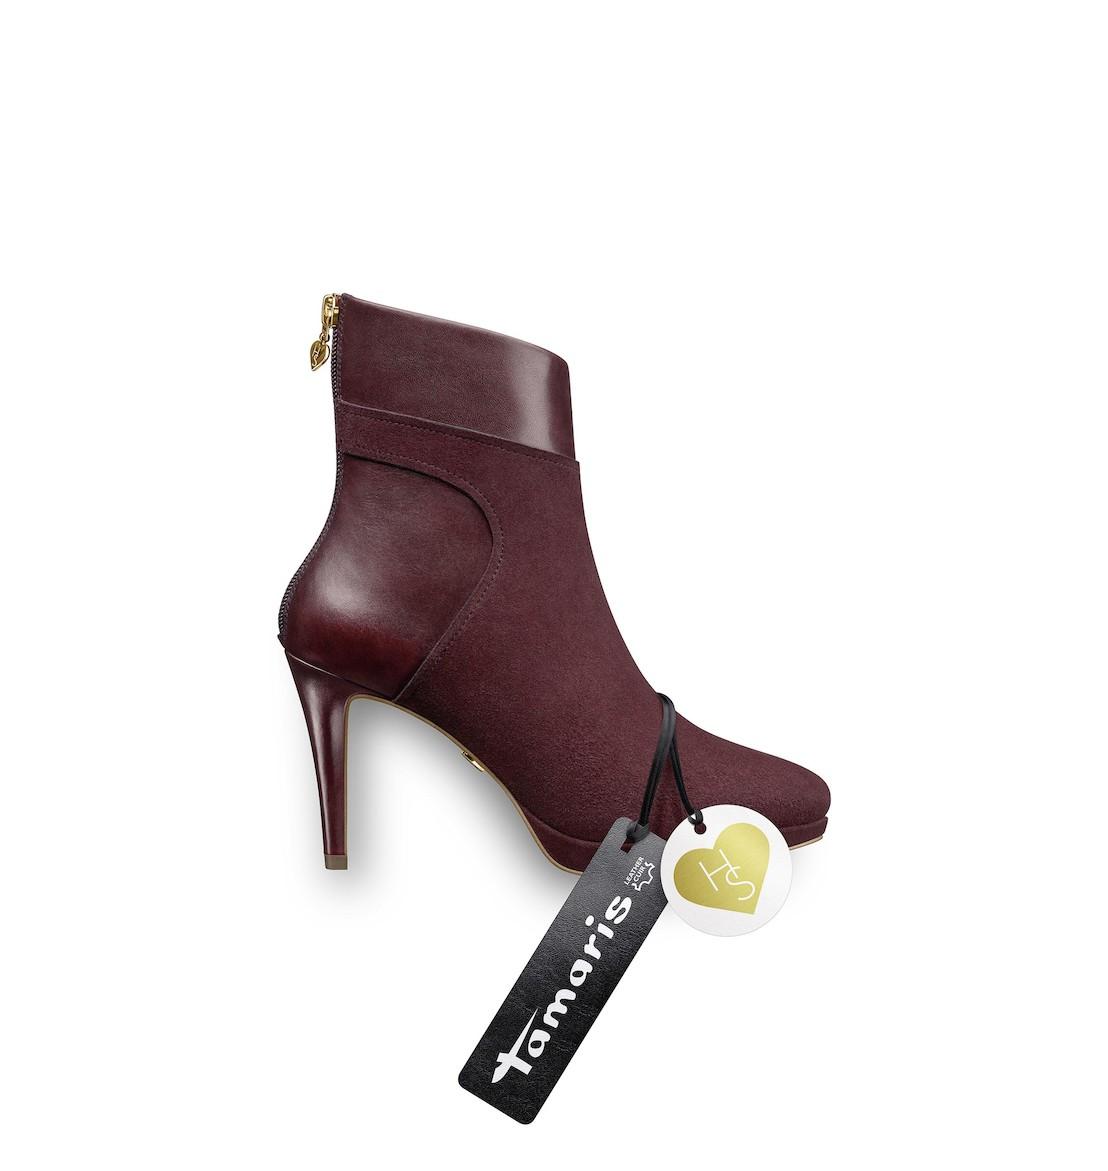 tamaris x heart sole fw17 revolutionising walking on heels. Black Bedroom Furniture Sets. Home Design Ideas